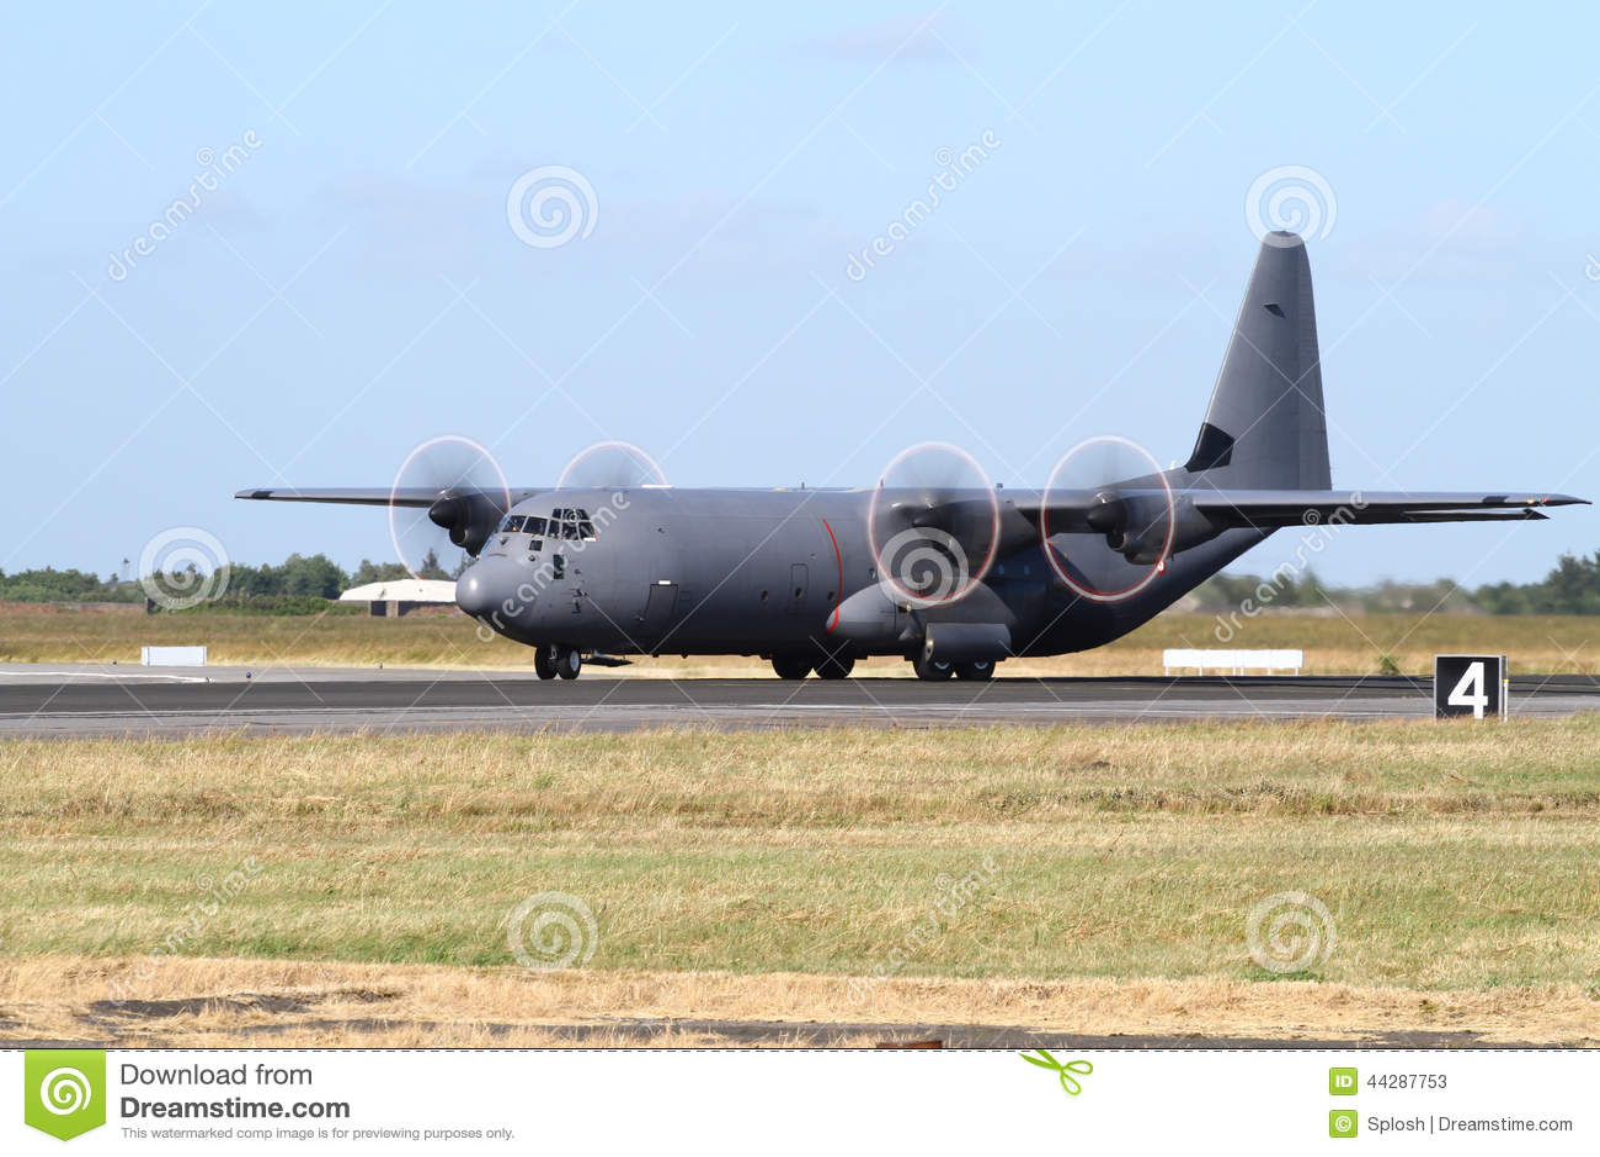 C-130 Hercules Military Transport Plane Stock Image ...